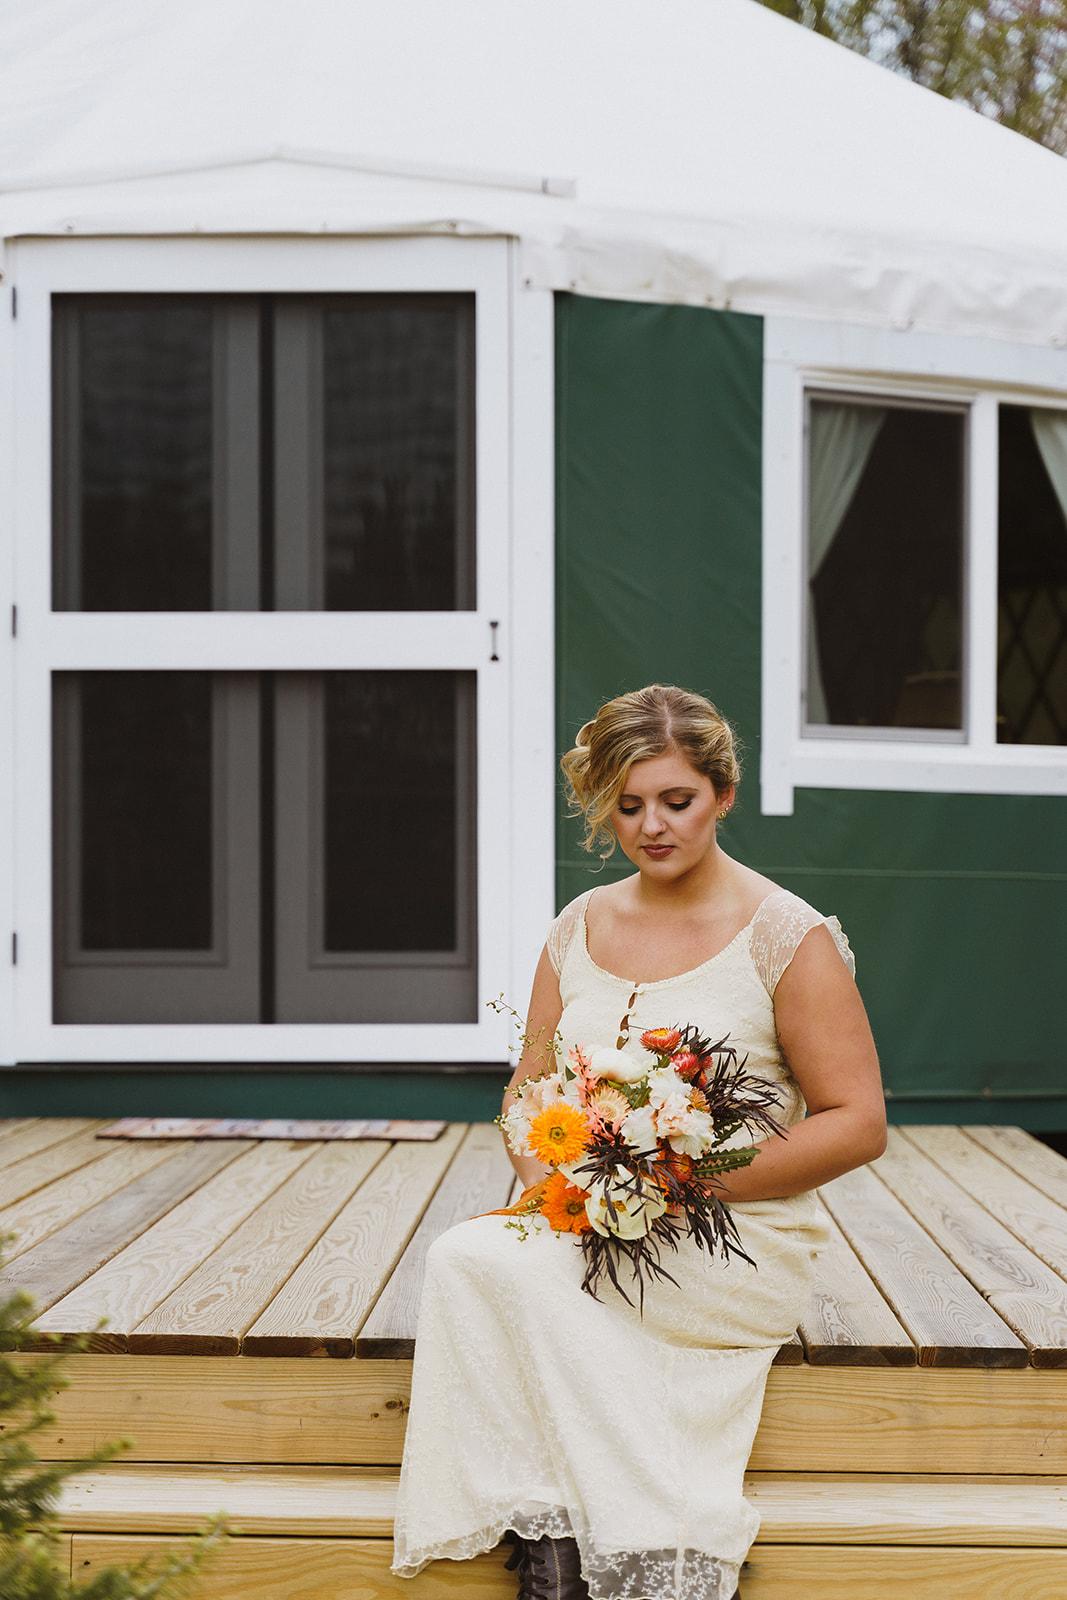 Tuckaway Tree Farm Lebanon Maine Wedding Inspiration 81